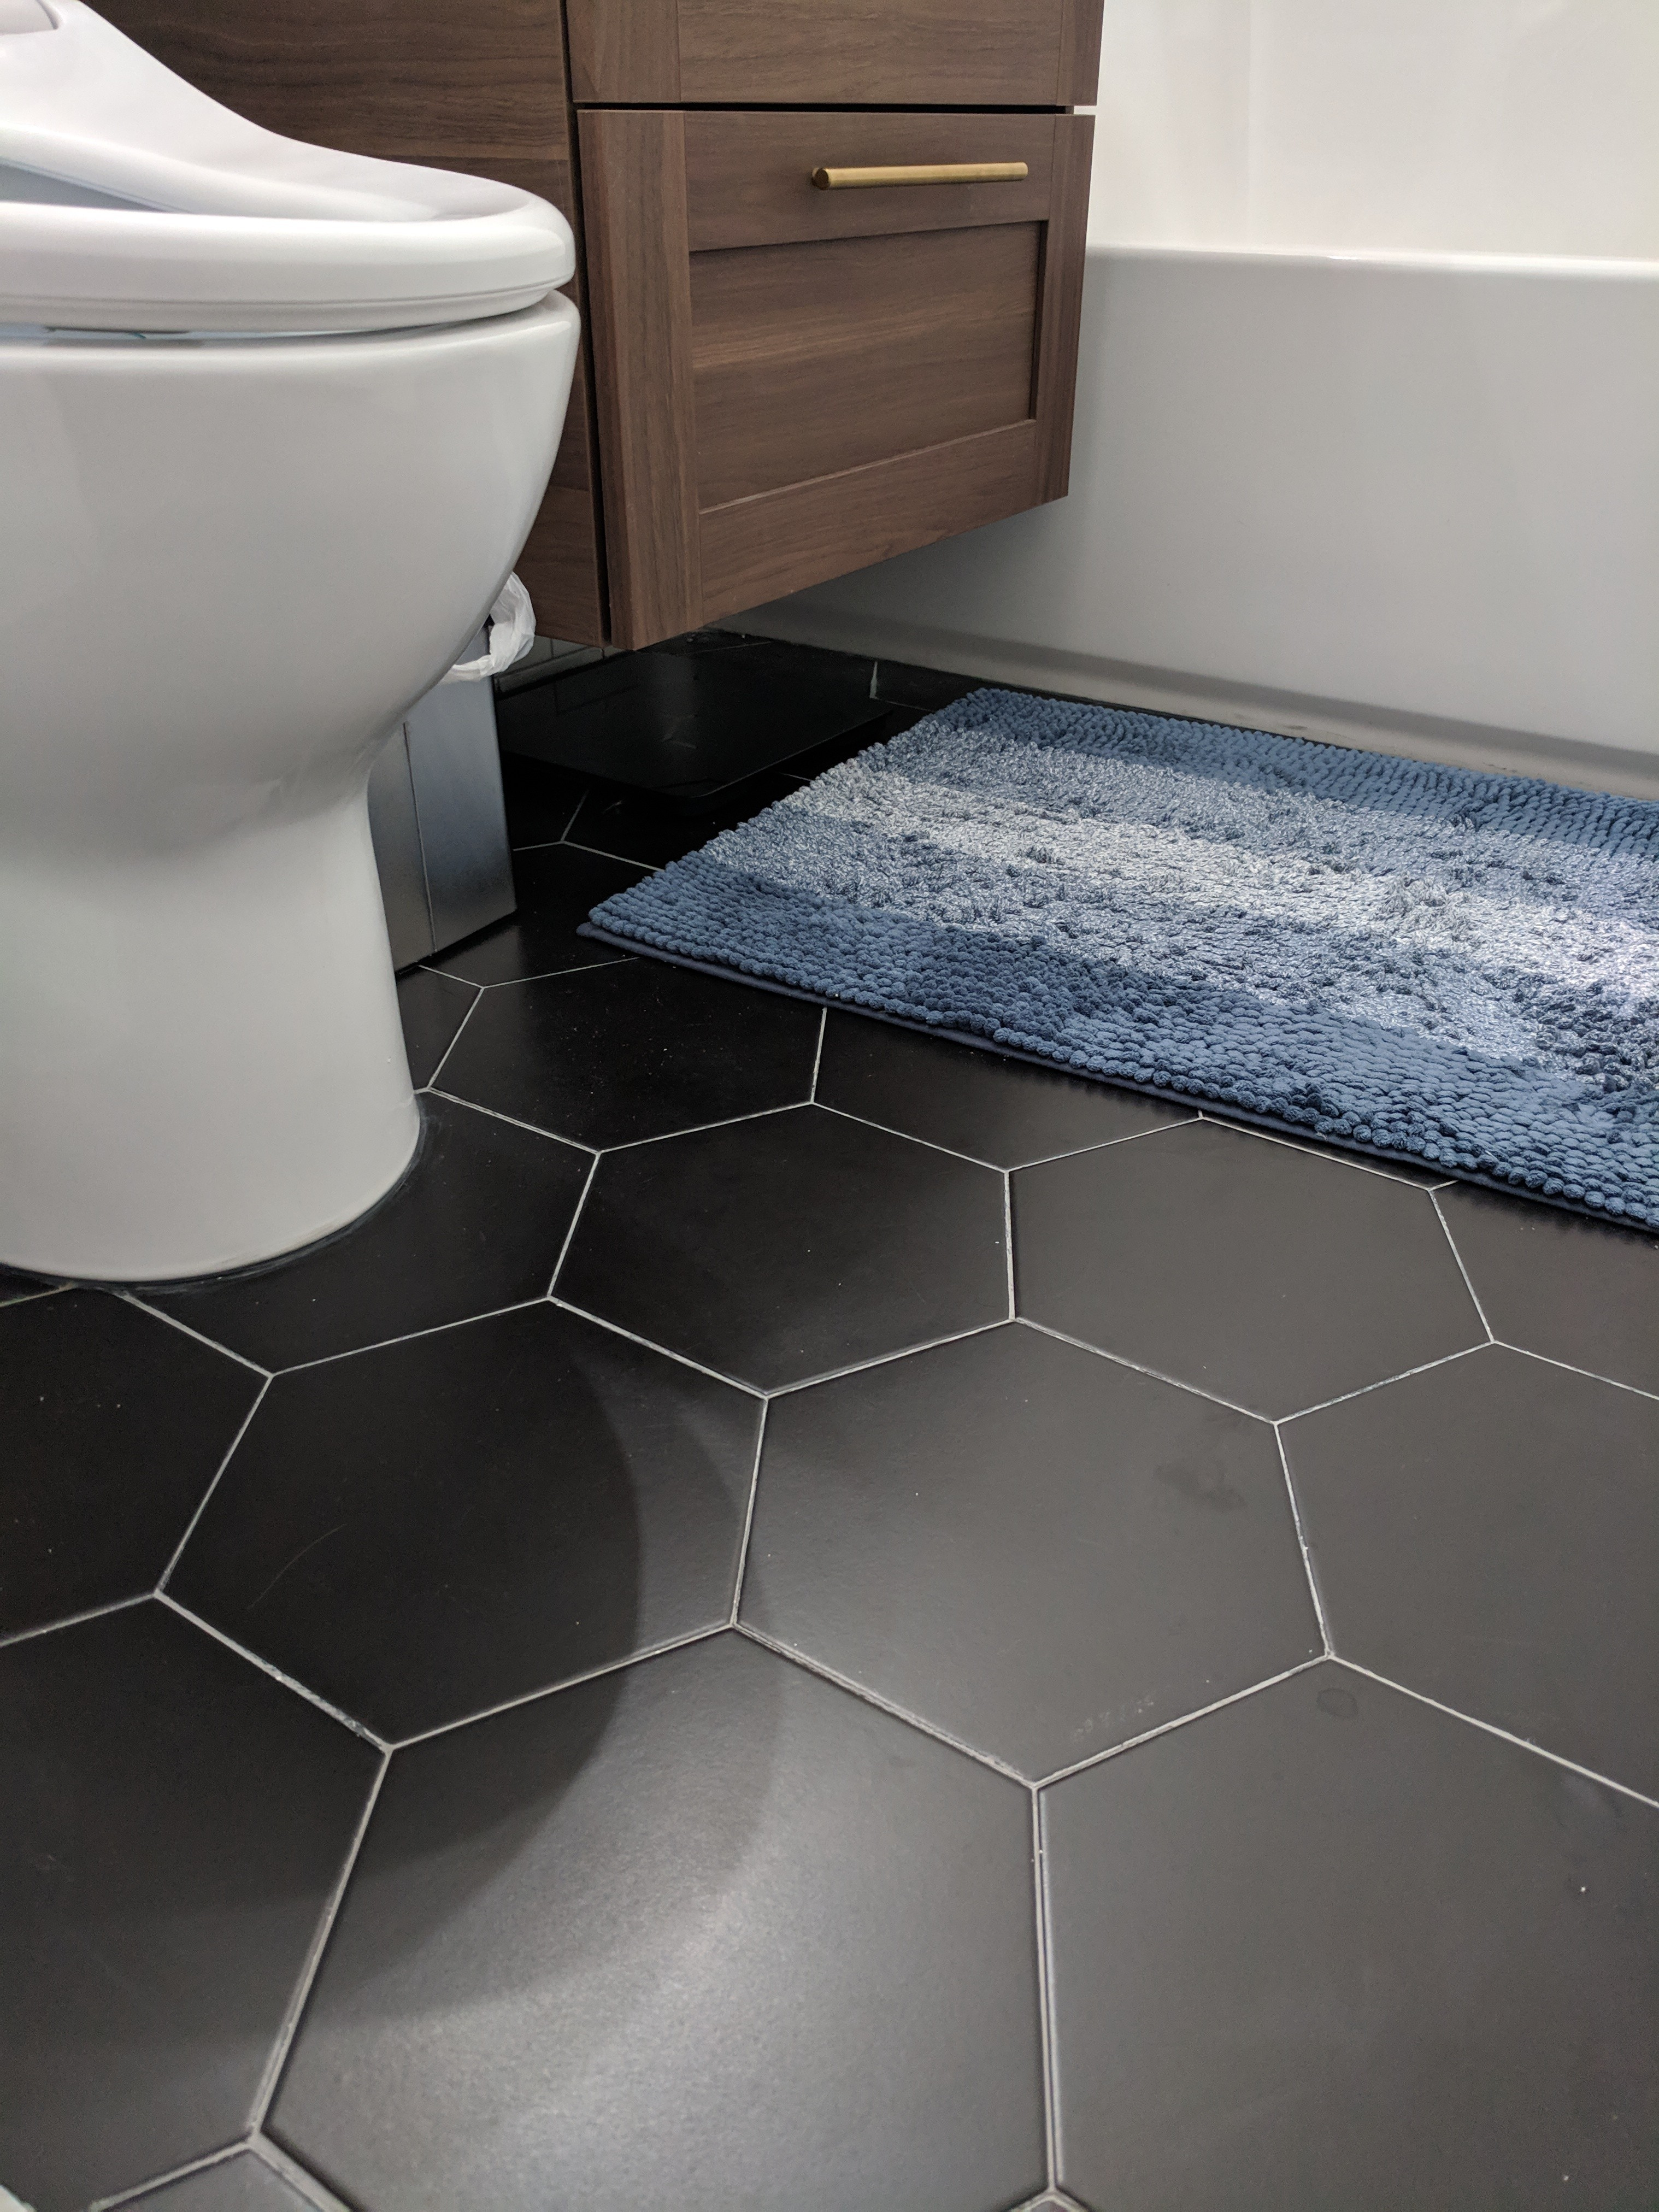 21 pieces of large black hexagon tiles